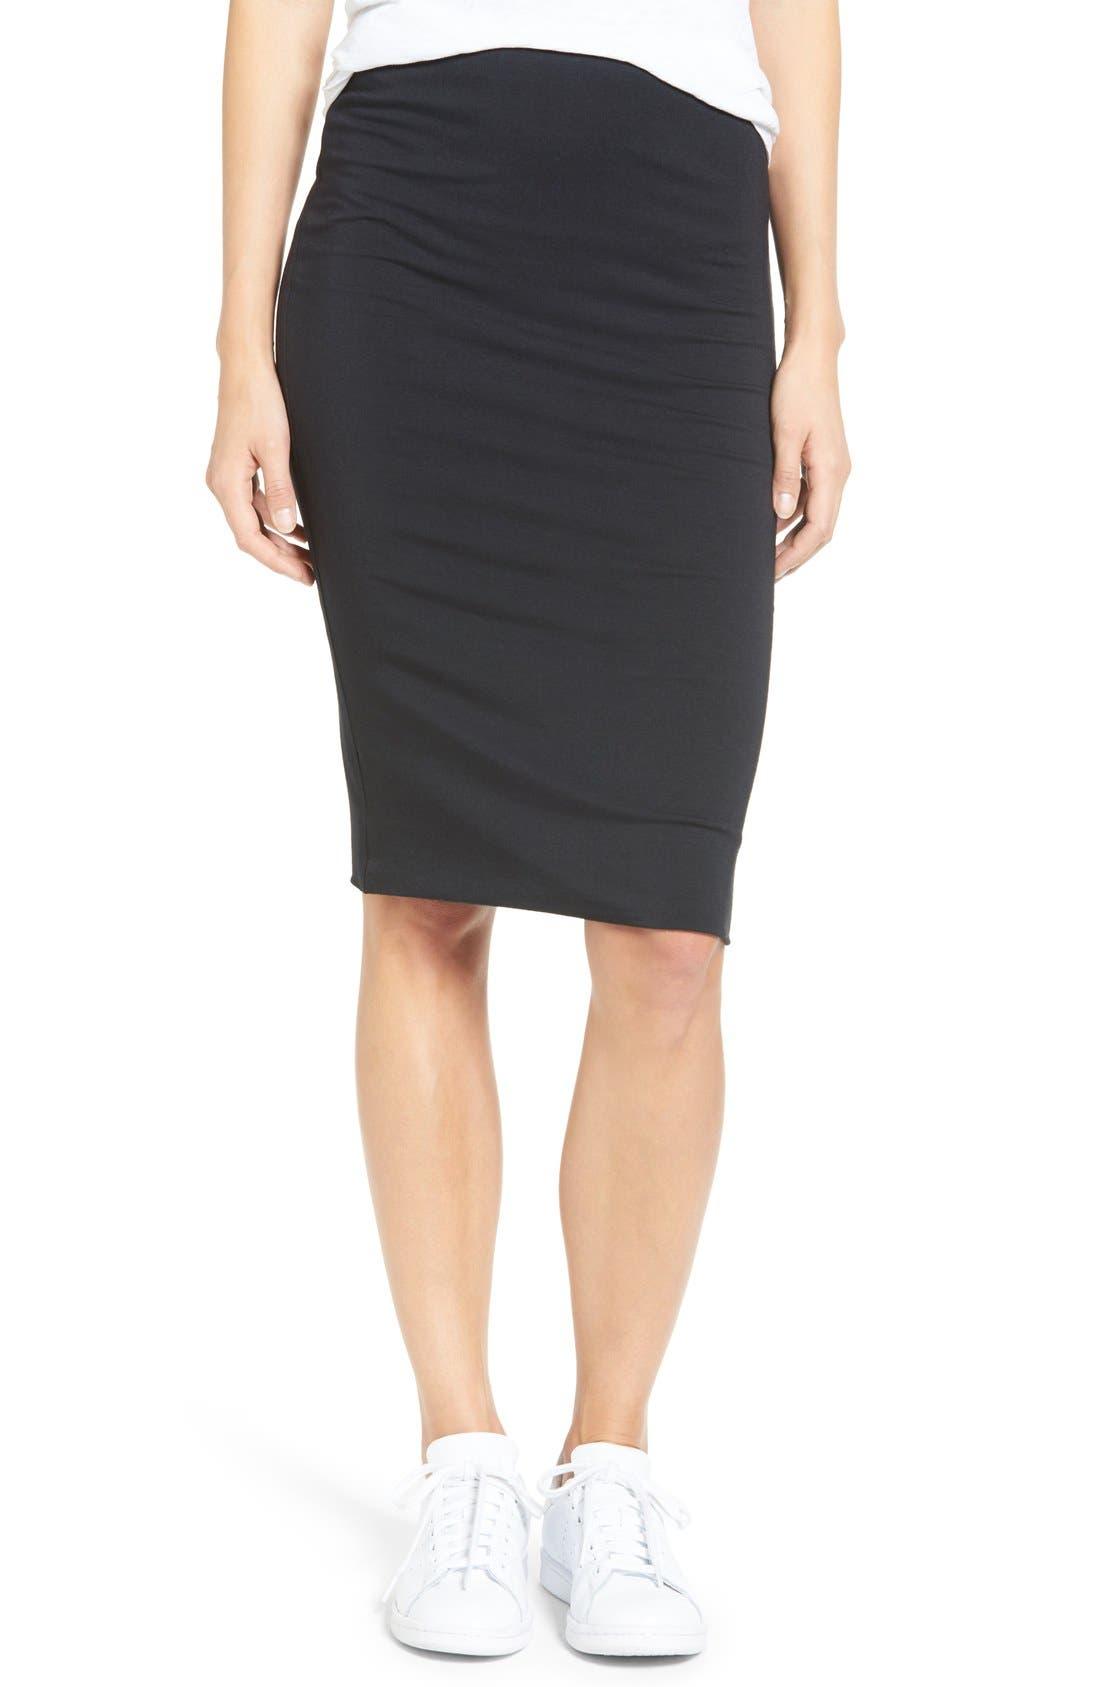 Alternate Image 1 Selected - Amour Vert 'Yuma' Stretch Knit Skirt